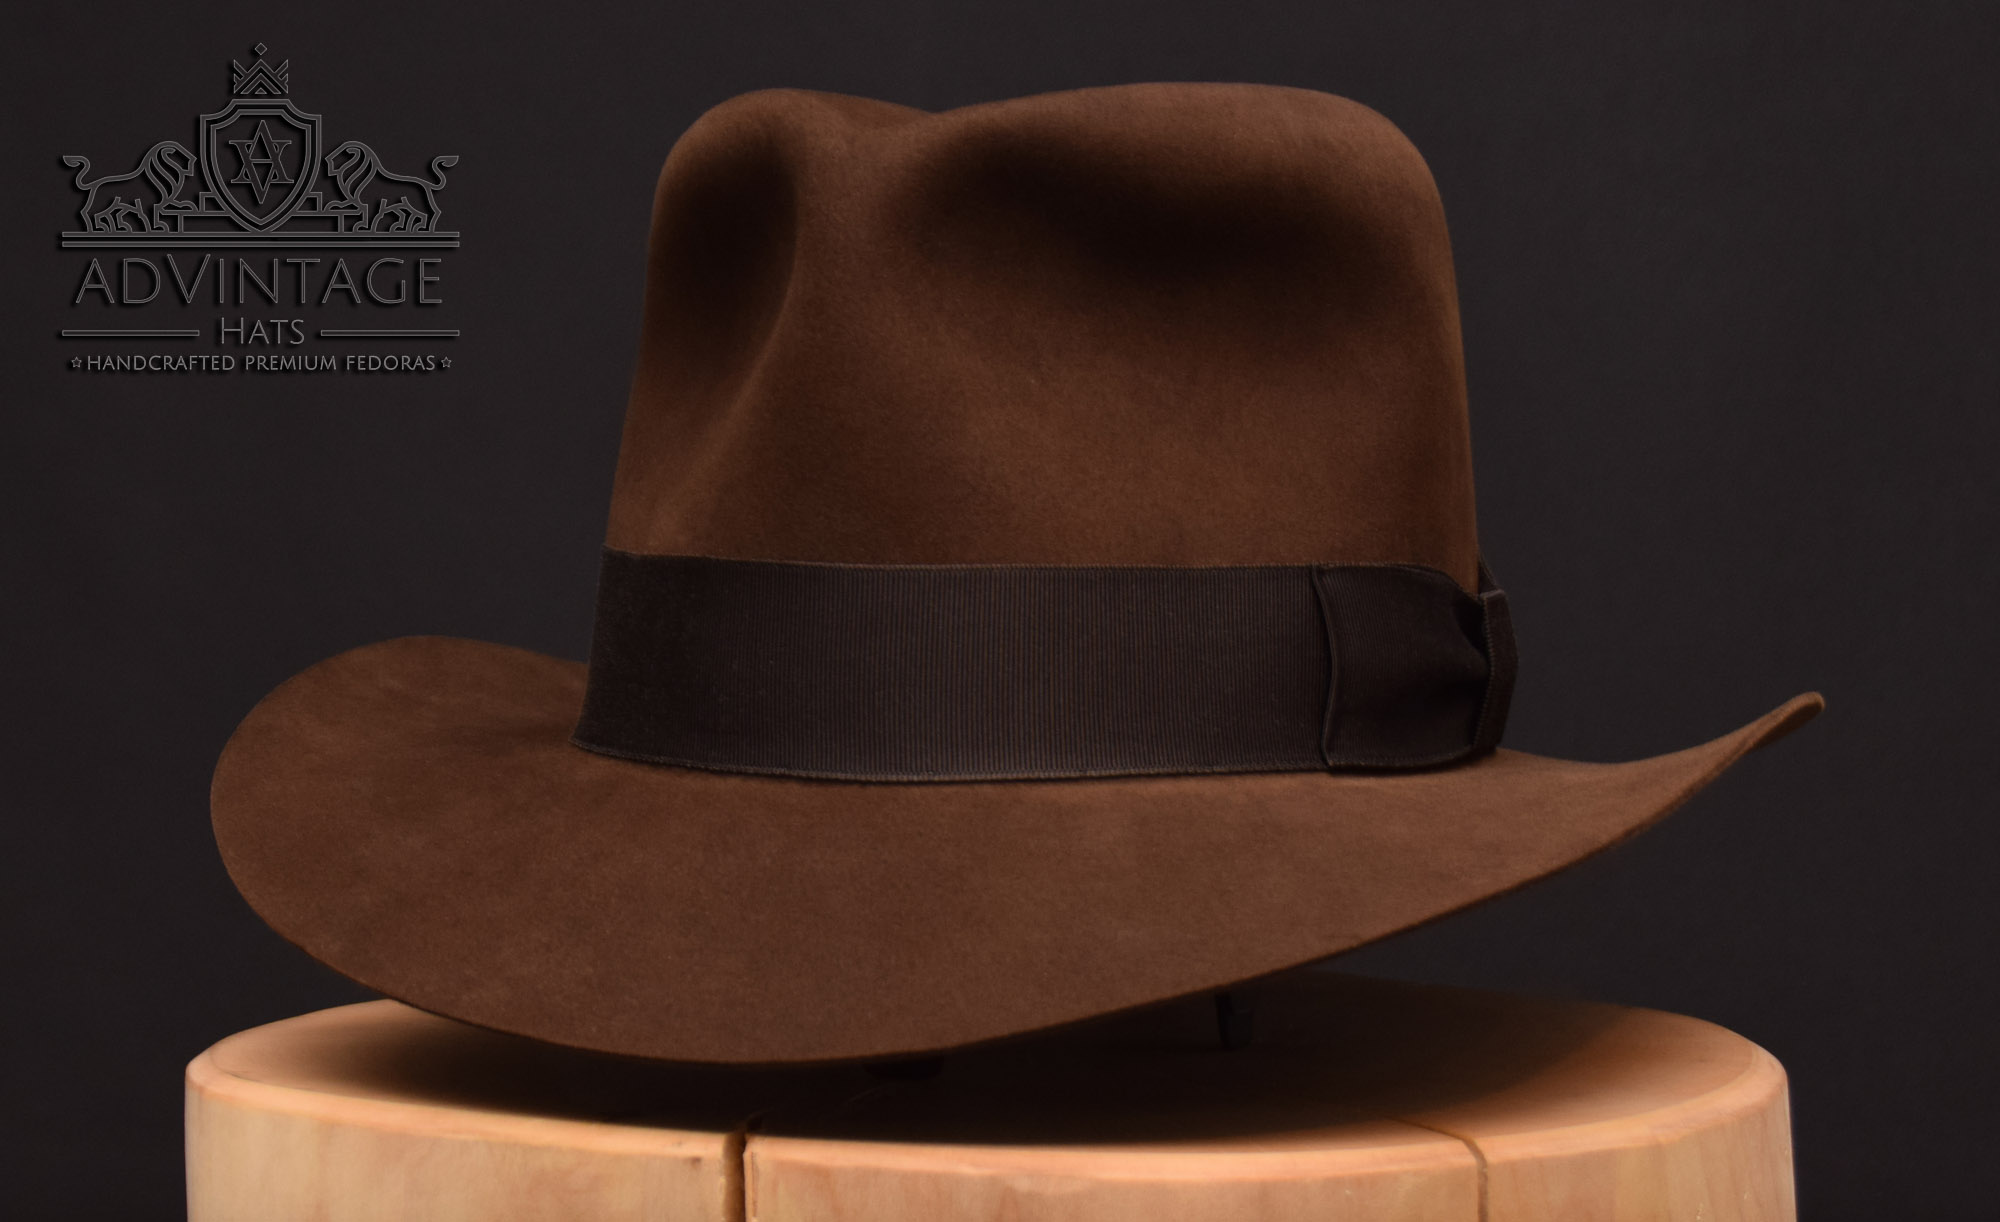 advintage hats masterpiece fedora indy indiana jones last crusade hut 4